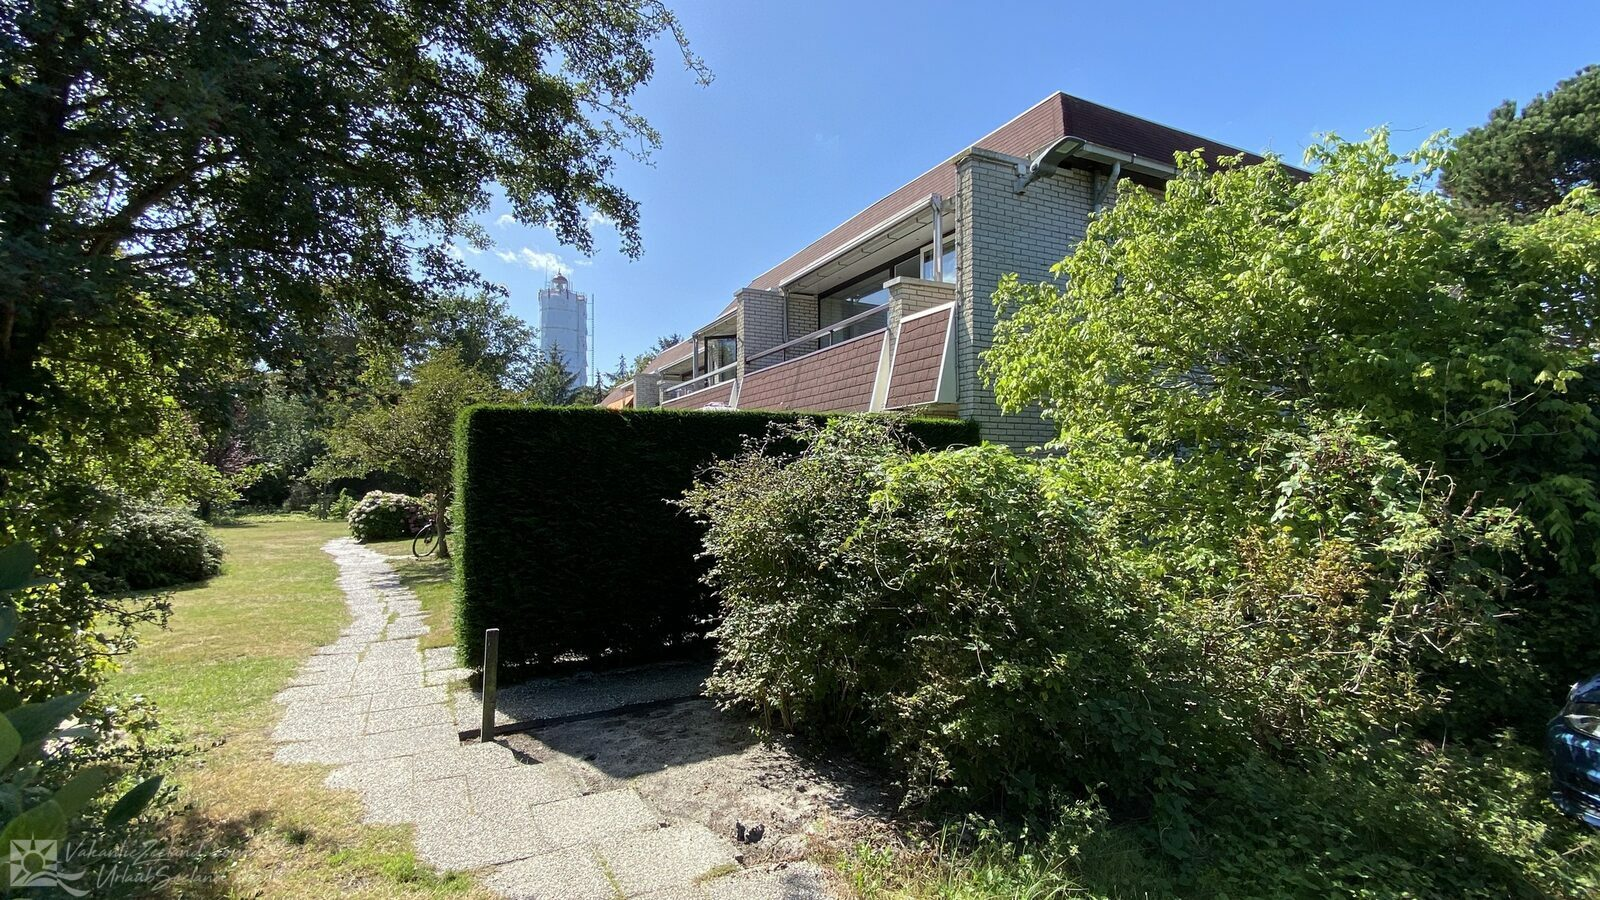 VZ678 Apartment Burgh-Haamstede